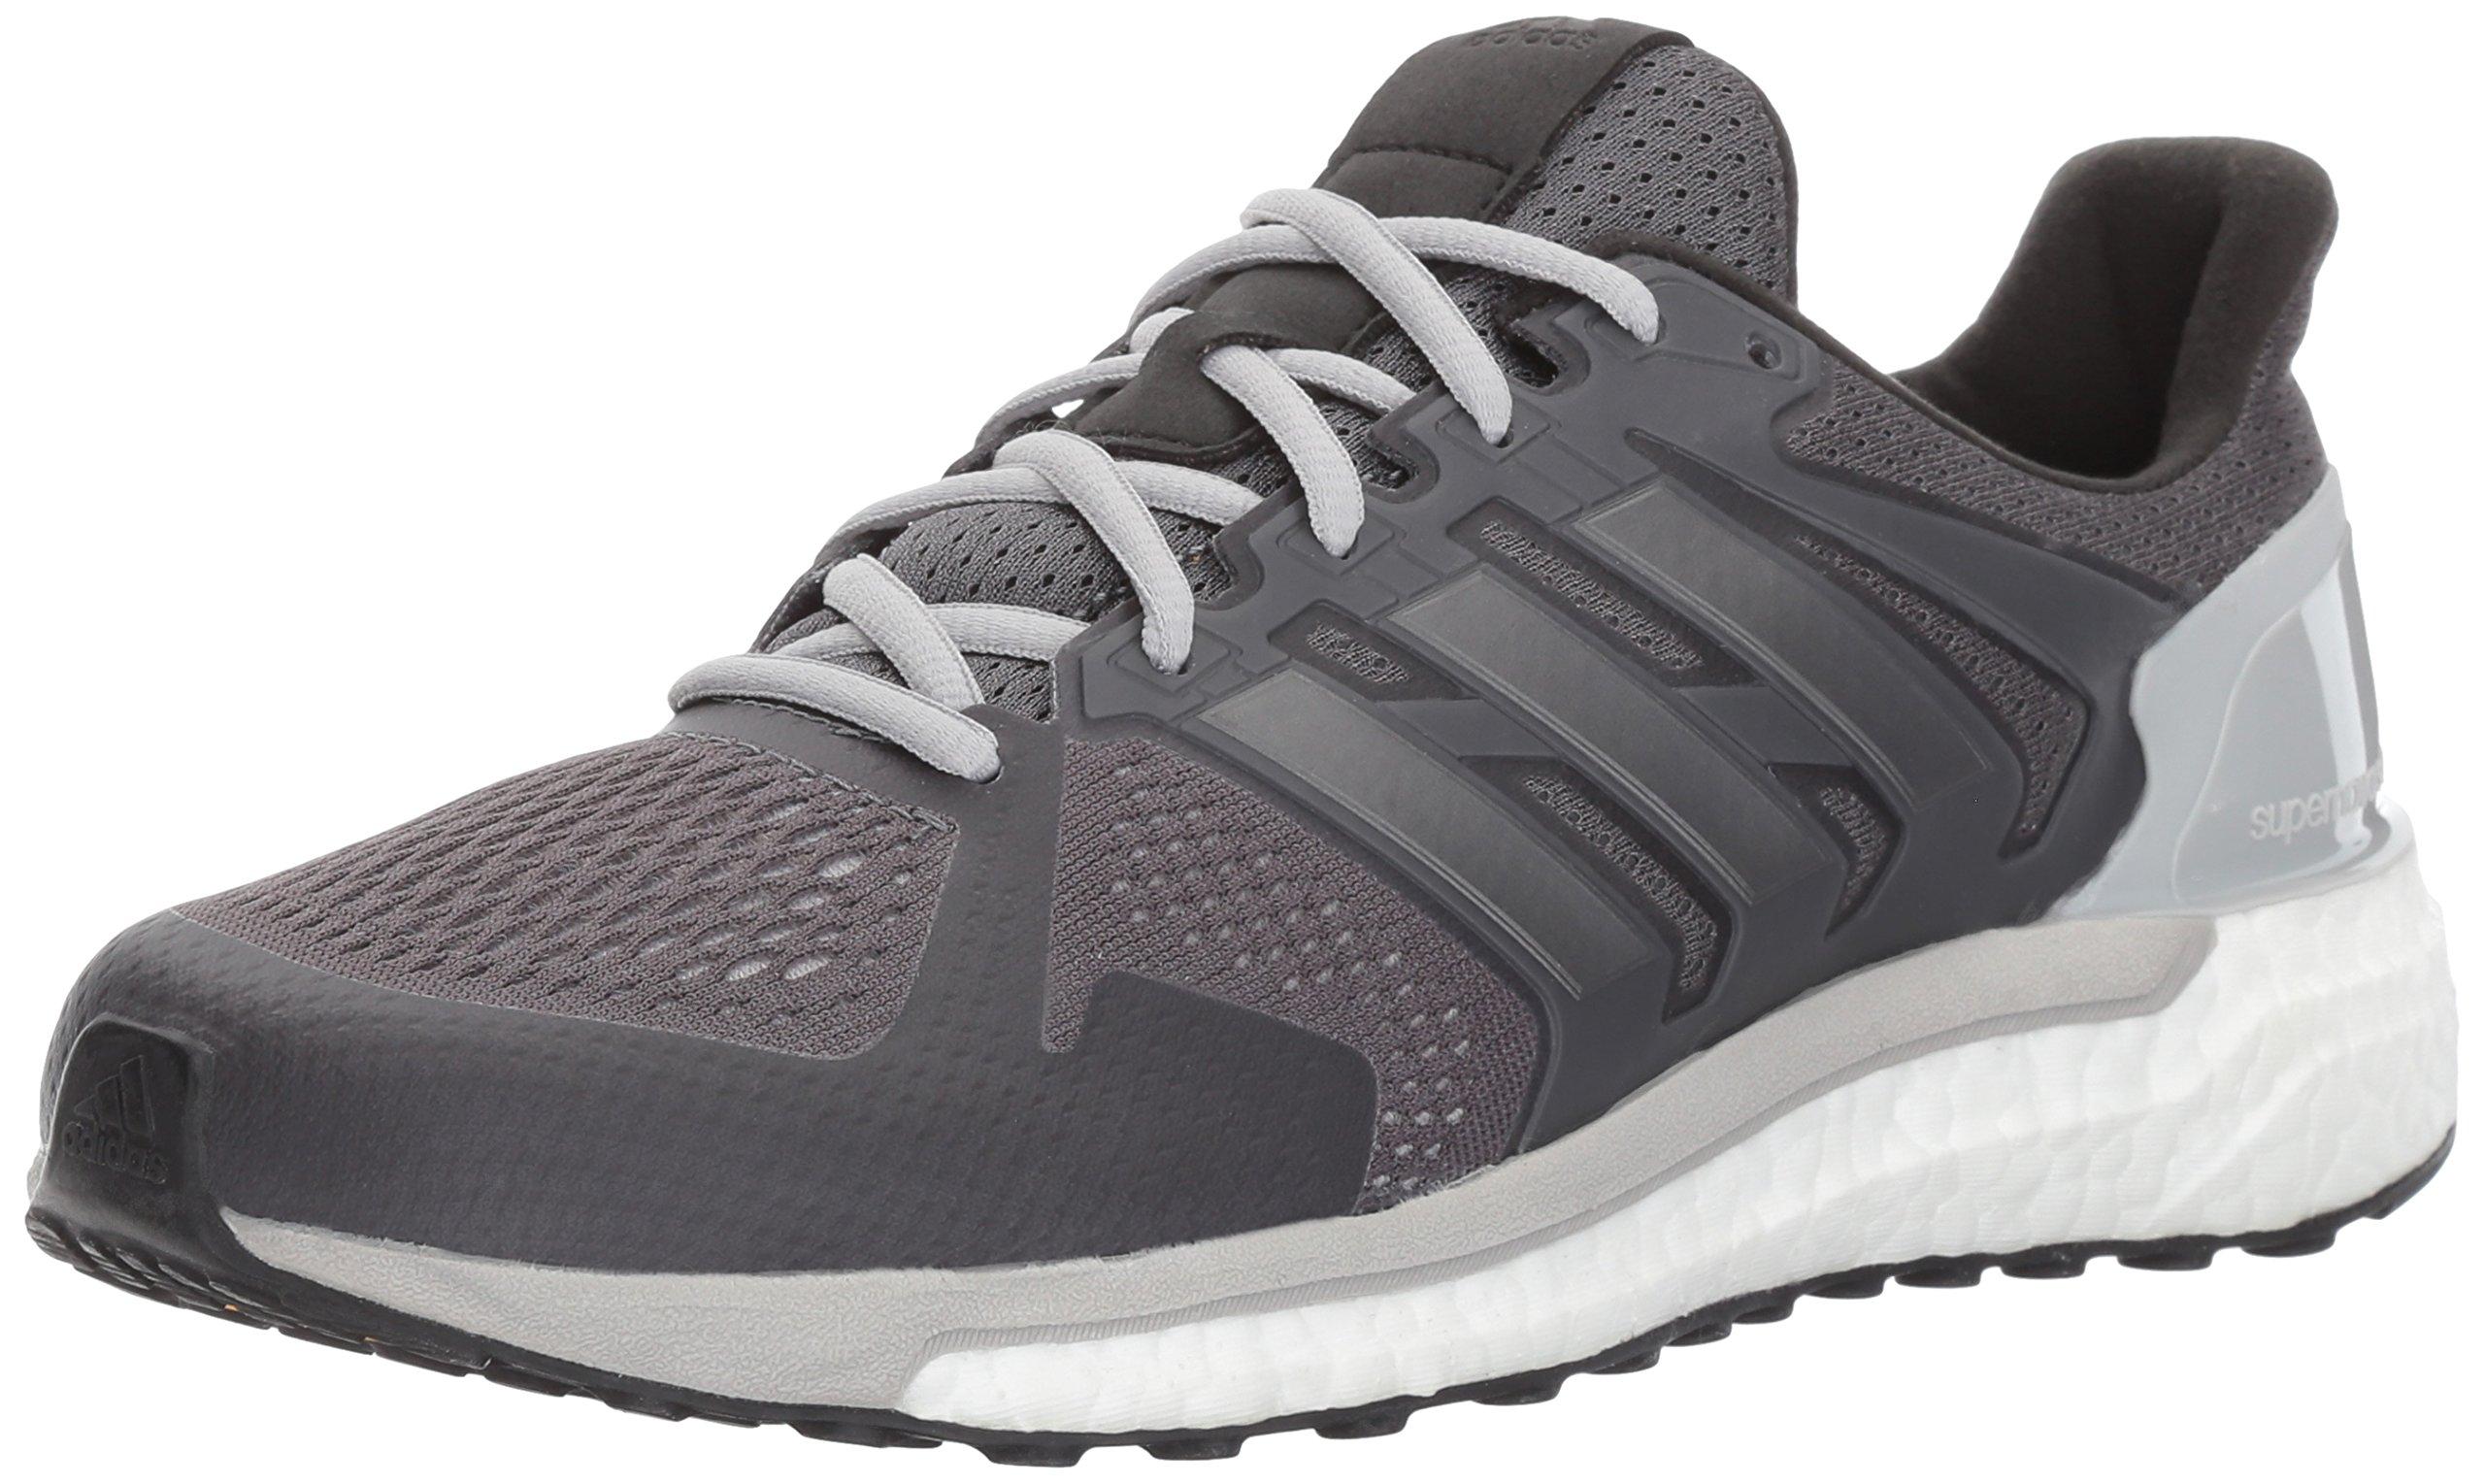 f6225aa3a Galleon - Adidas Women s Supernova St W Running Shoe